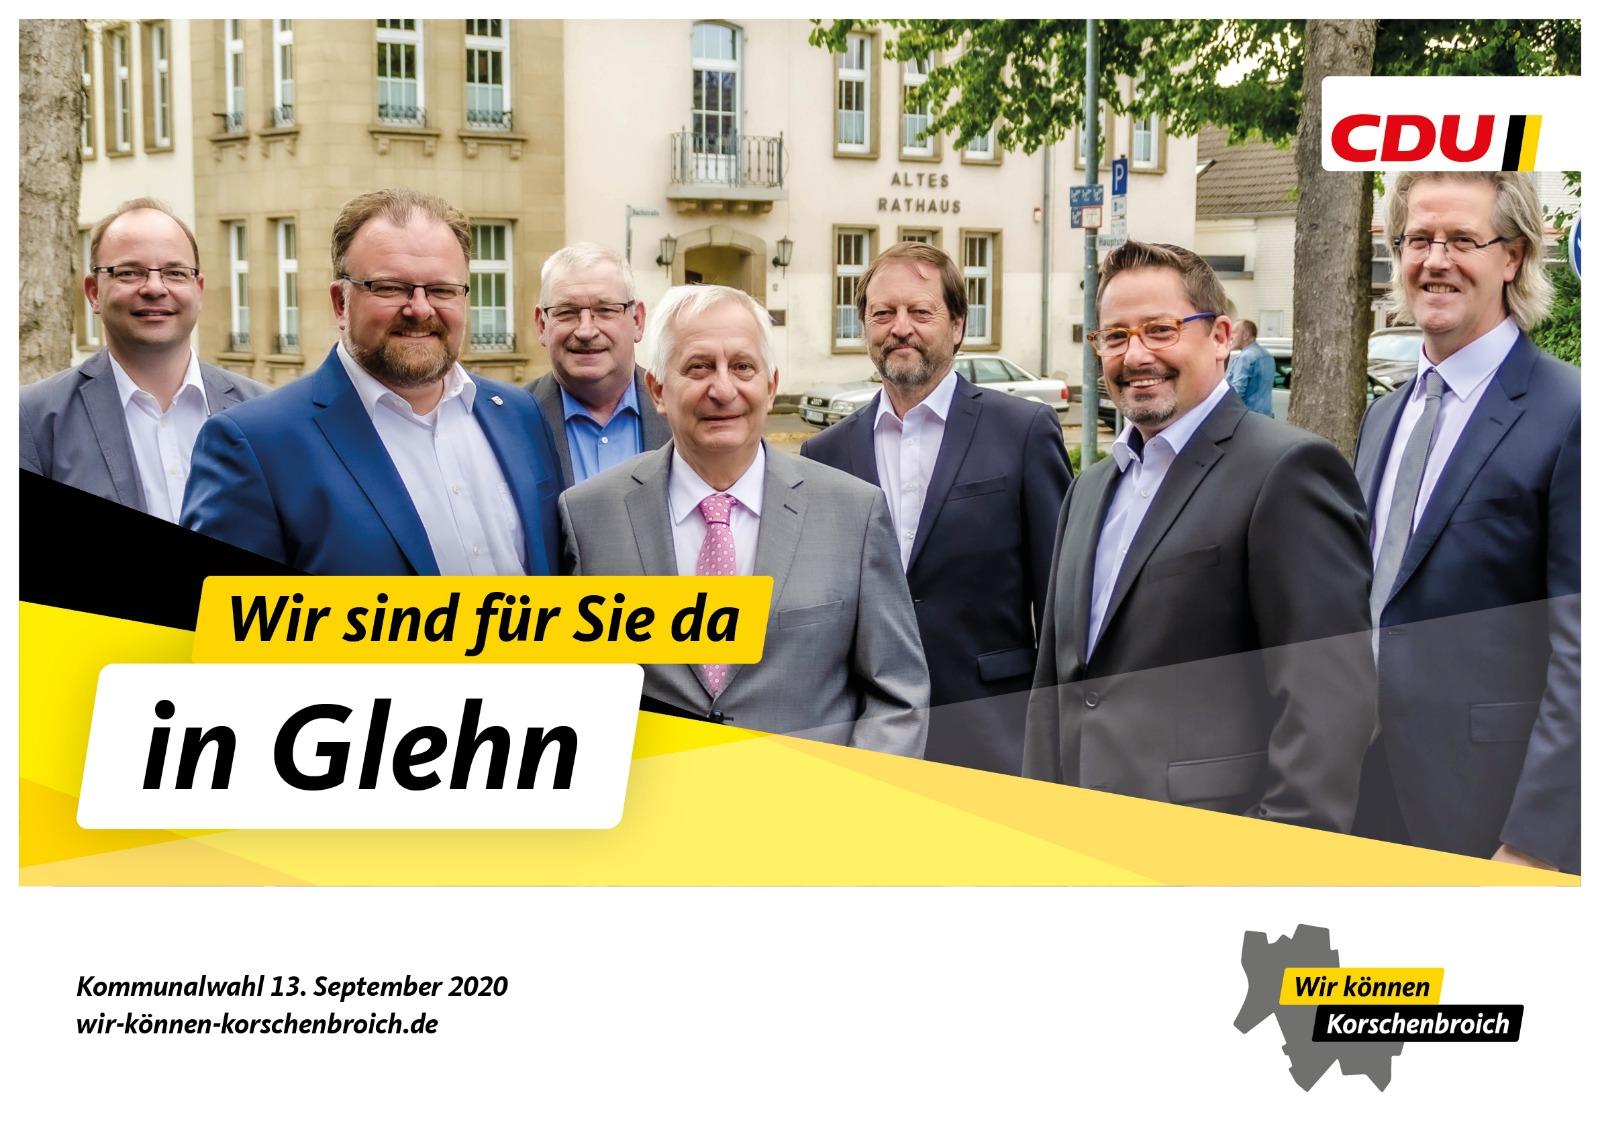 CDU in Glehn